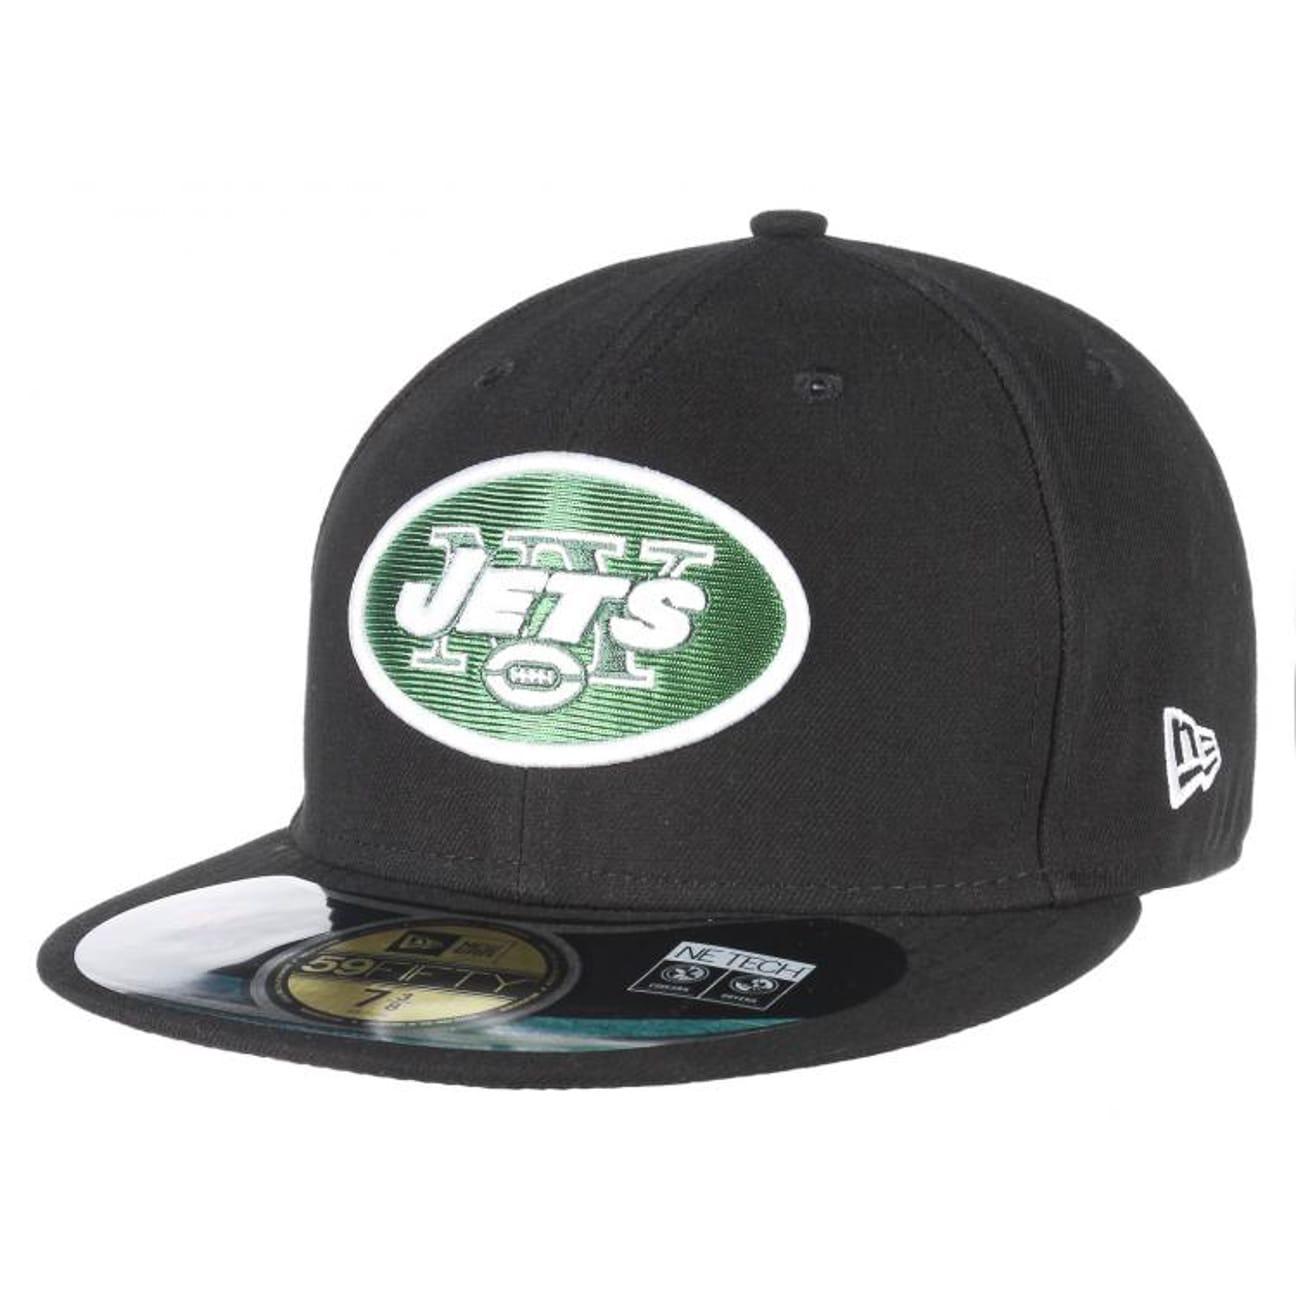 bbdda631fab99 Gorra Jets NFL Onfield by New Era - Gorras - sombreroshop.es